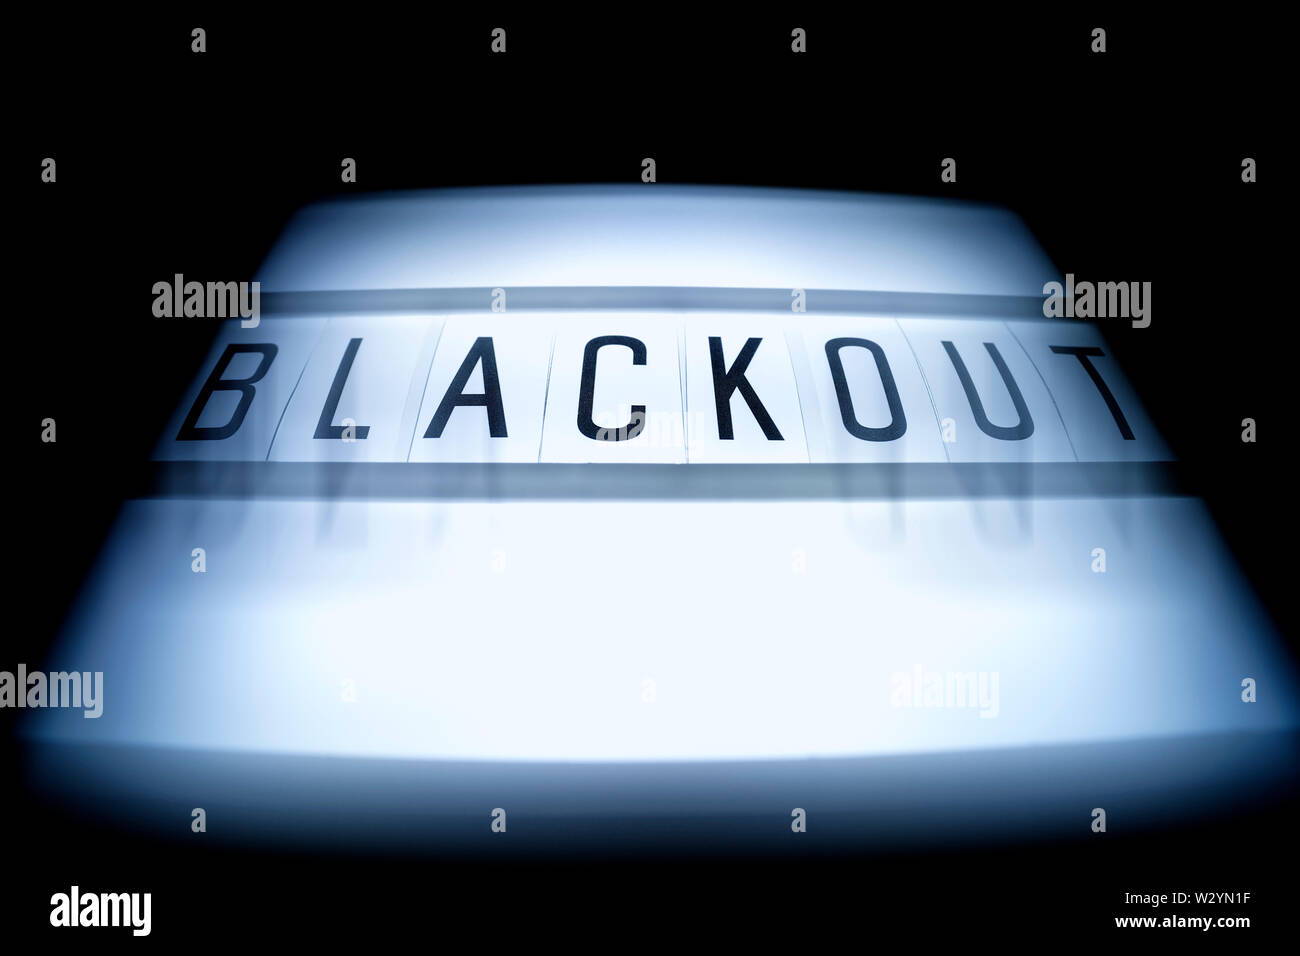 The word blackout on an illuminated panel, power failure - Stock Image